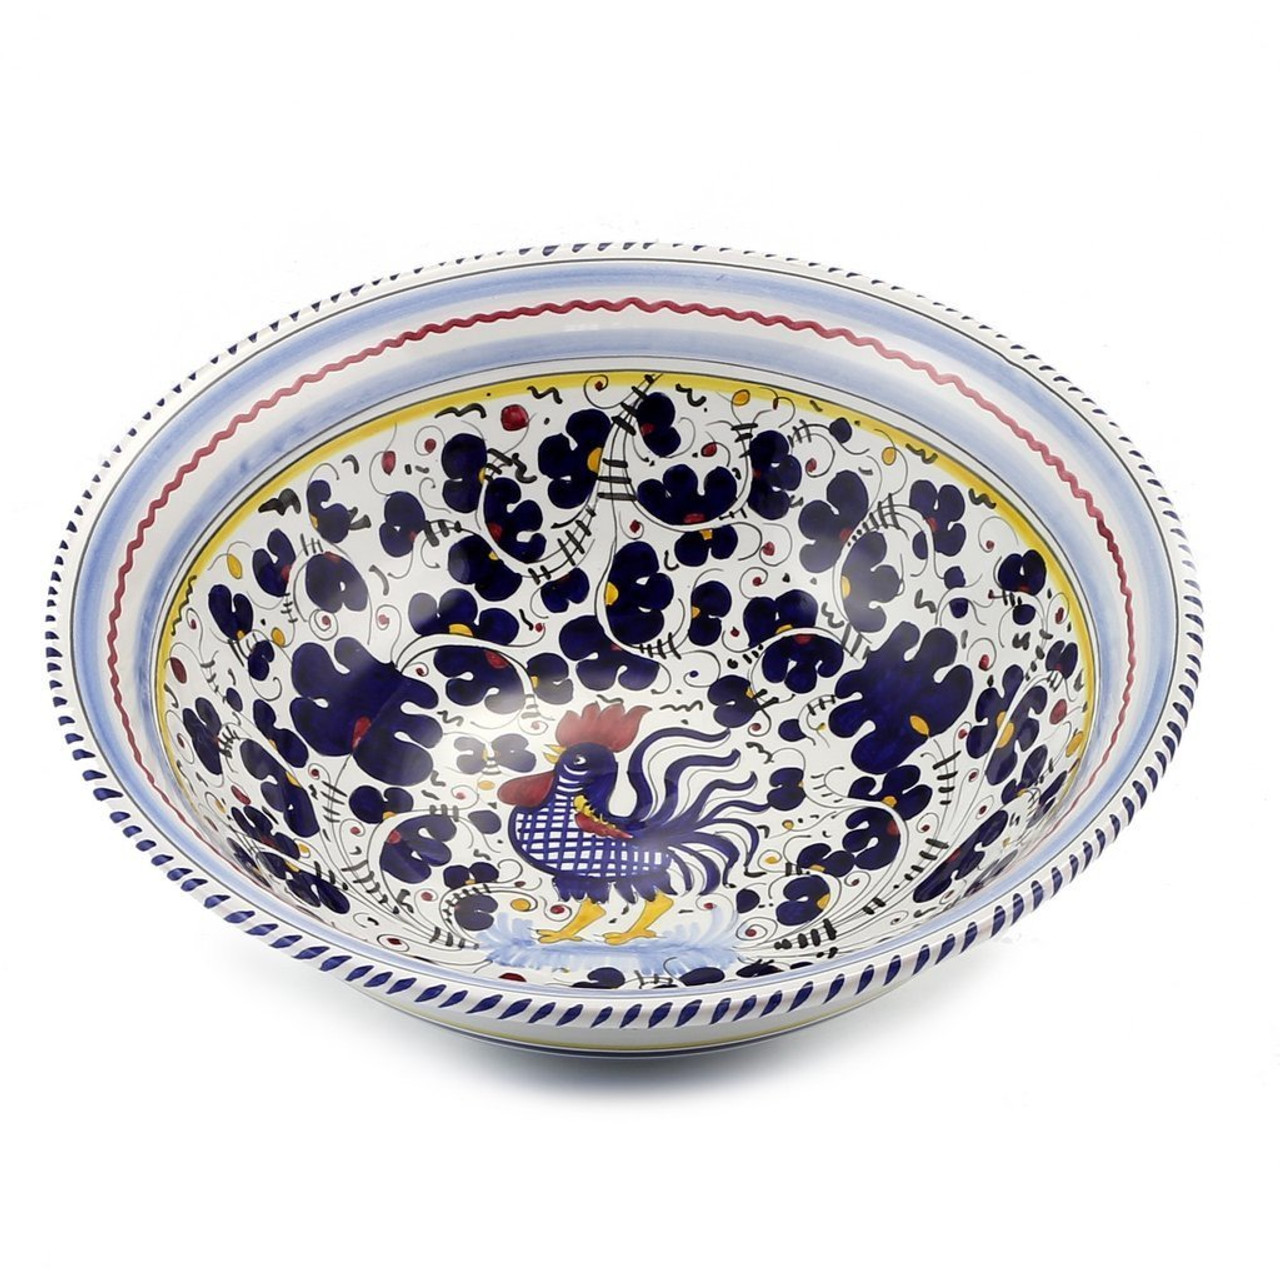 Orvieto Blue Large Pasta Salad Serving Bowl Italian Ceramics